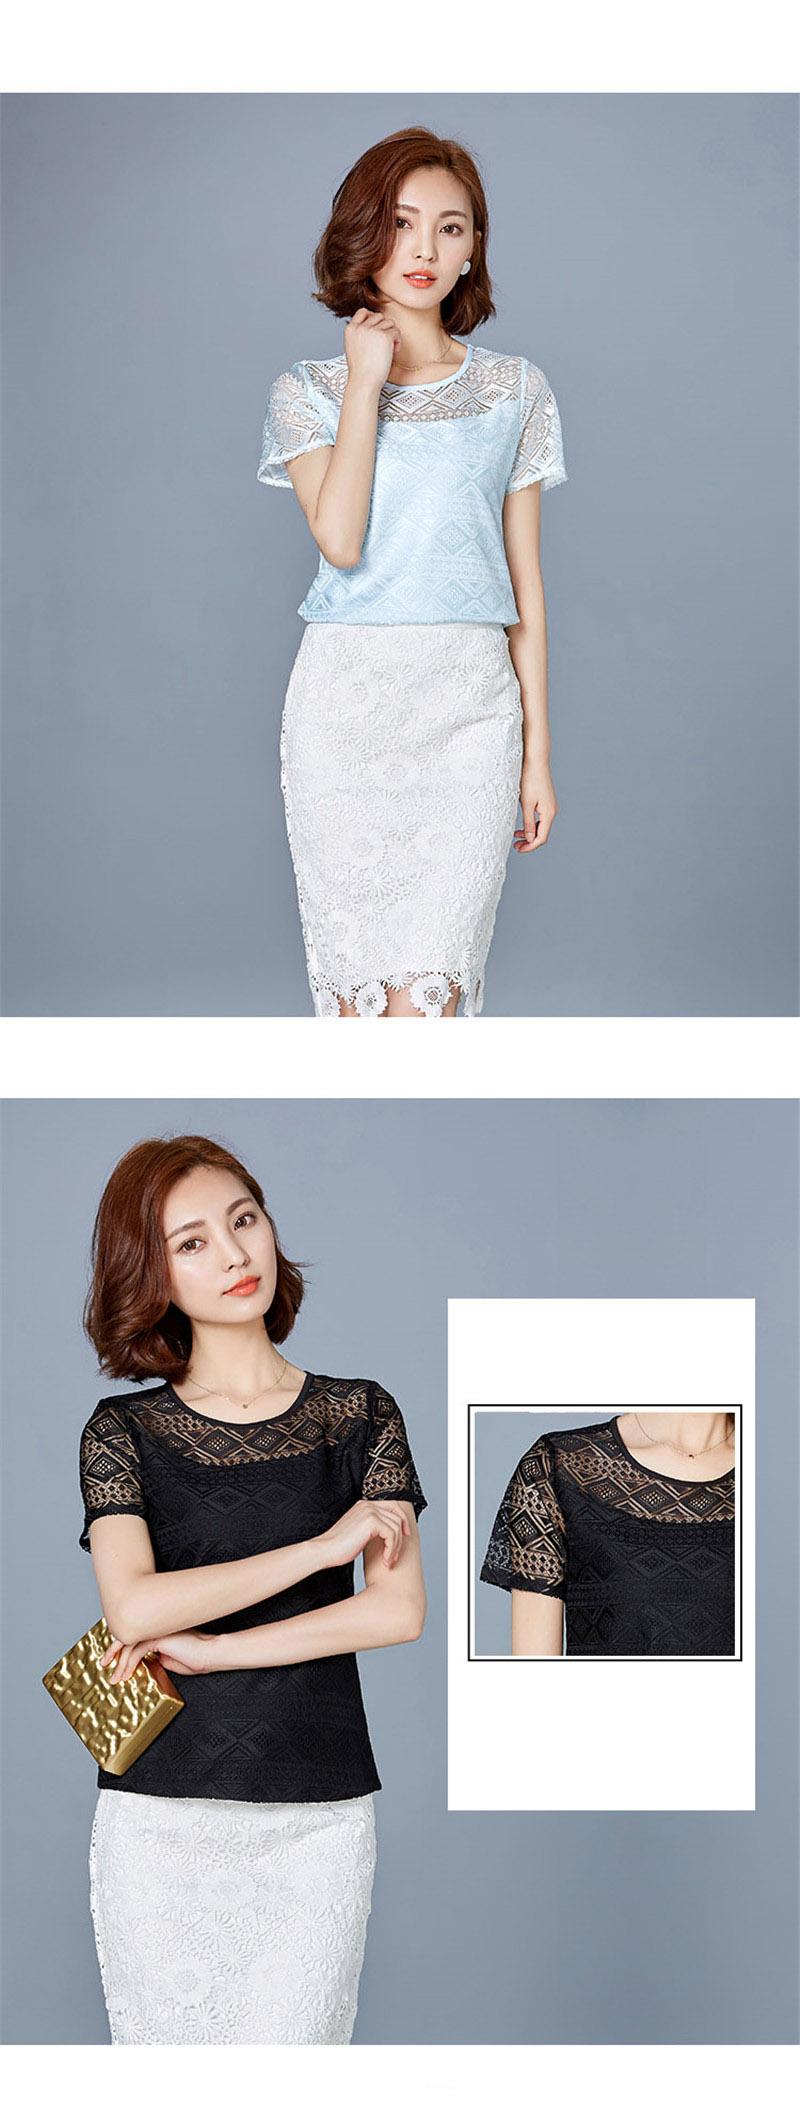 HTB1X37IPpXXXXX1apXXq6xXFXXXg - New women tops lace chiffon blouse korean office female clothing